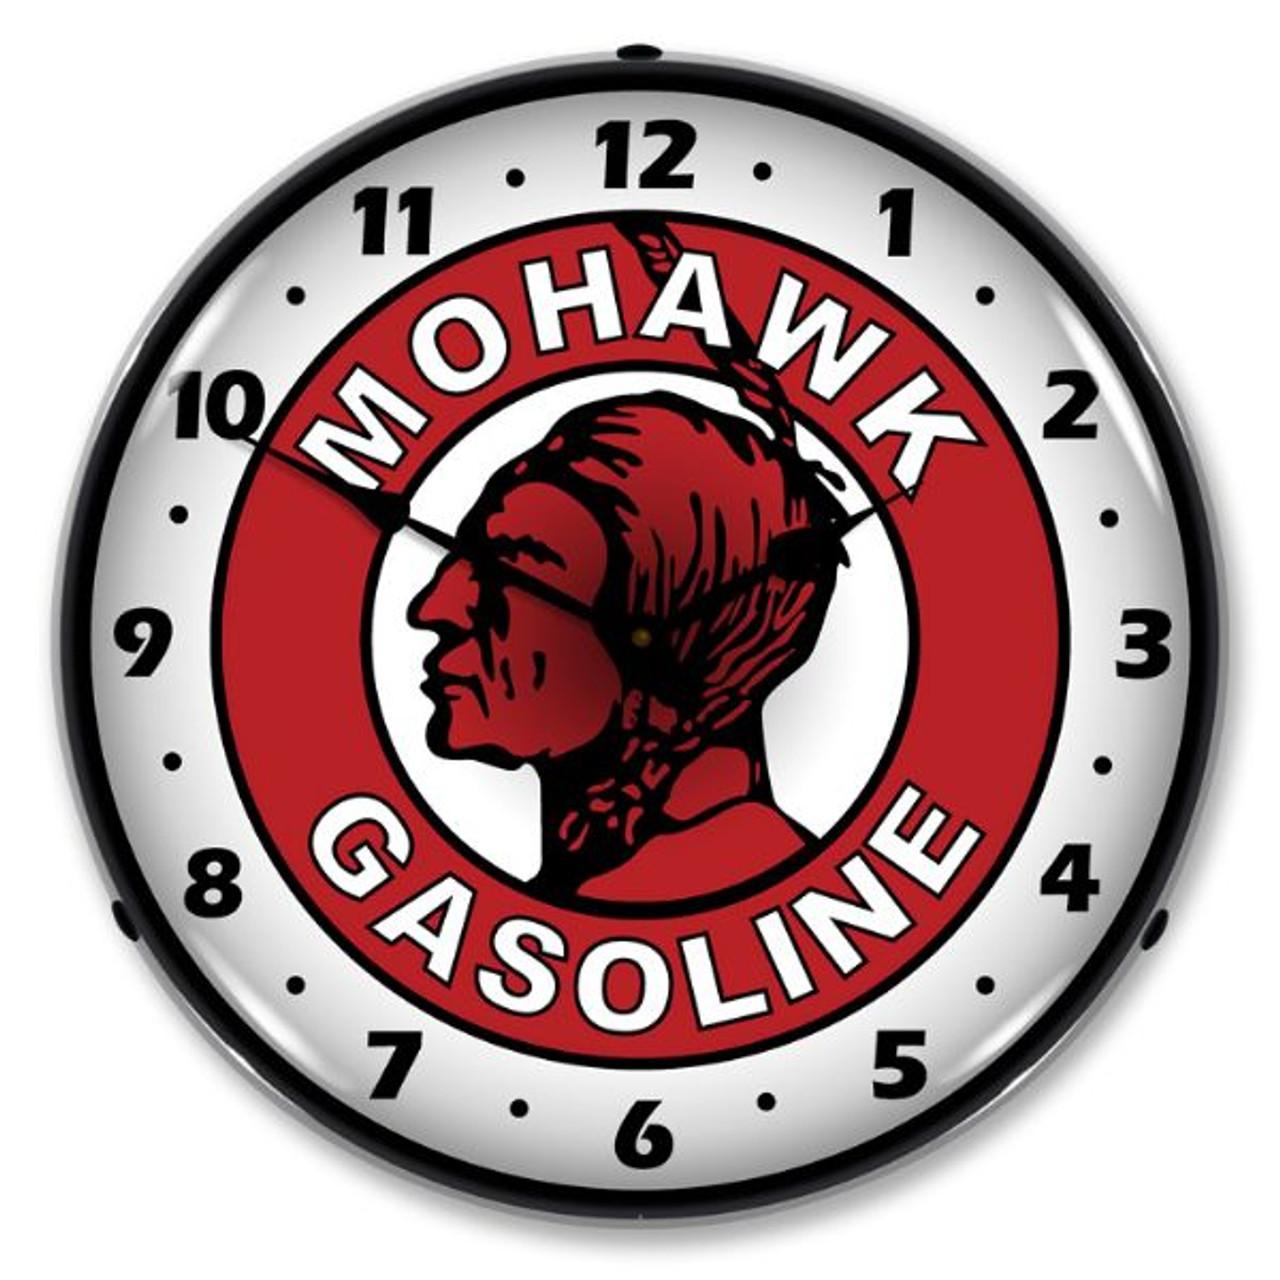 Mohawk Gasoline Lighted Wall Clock